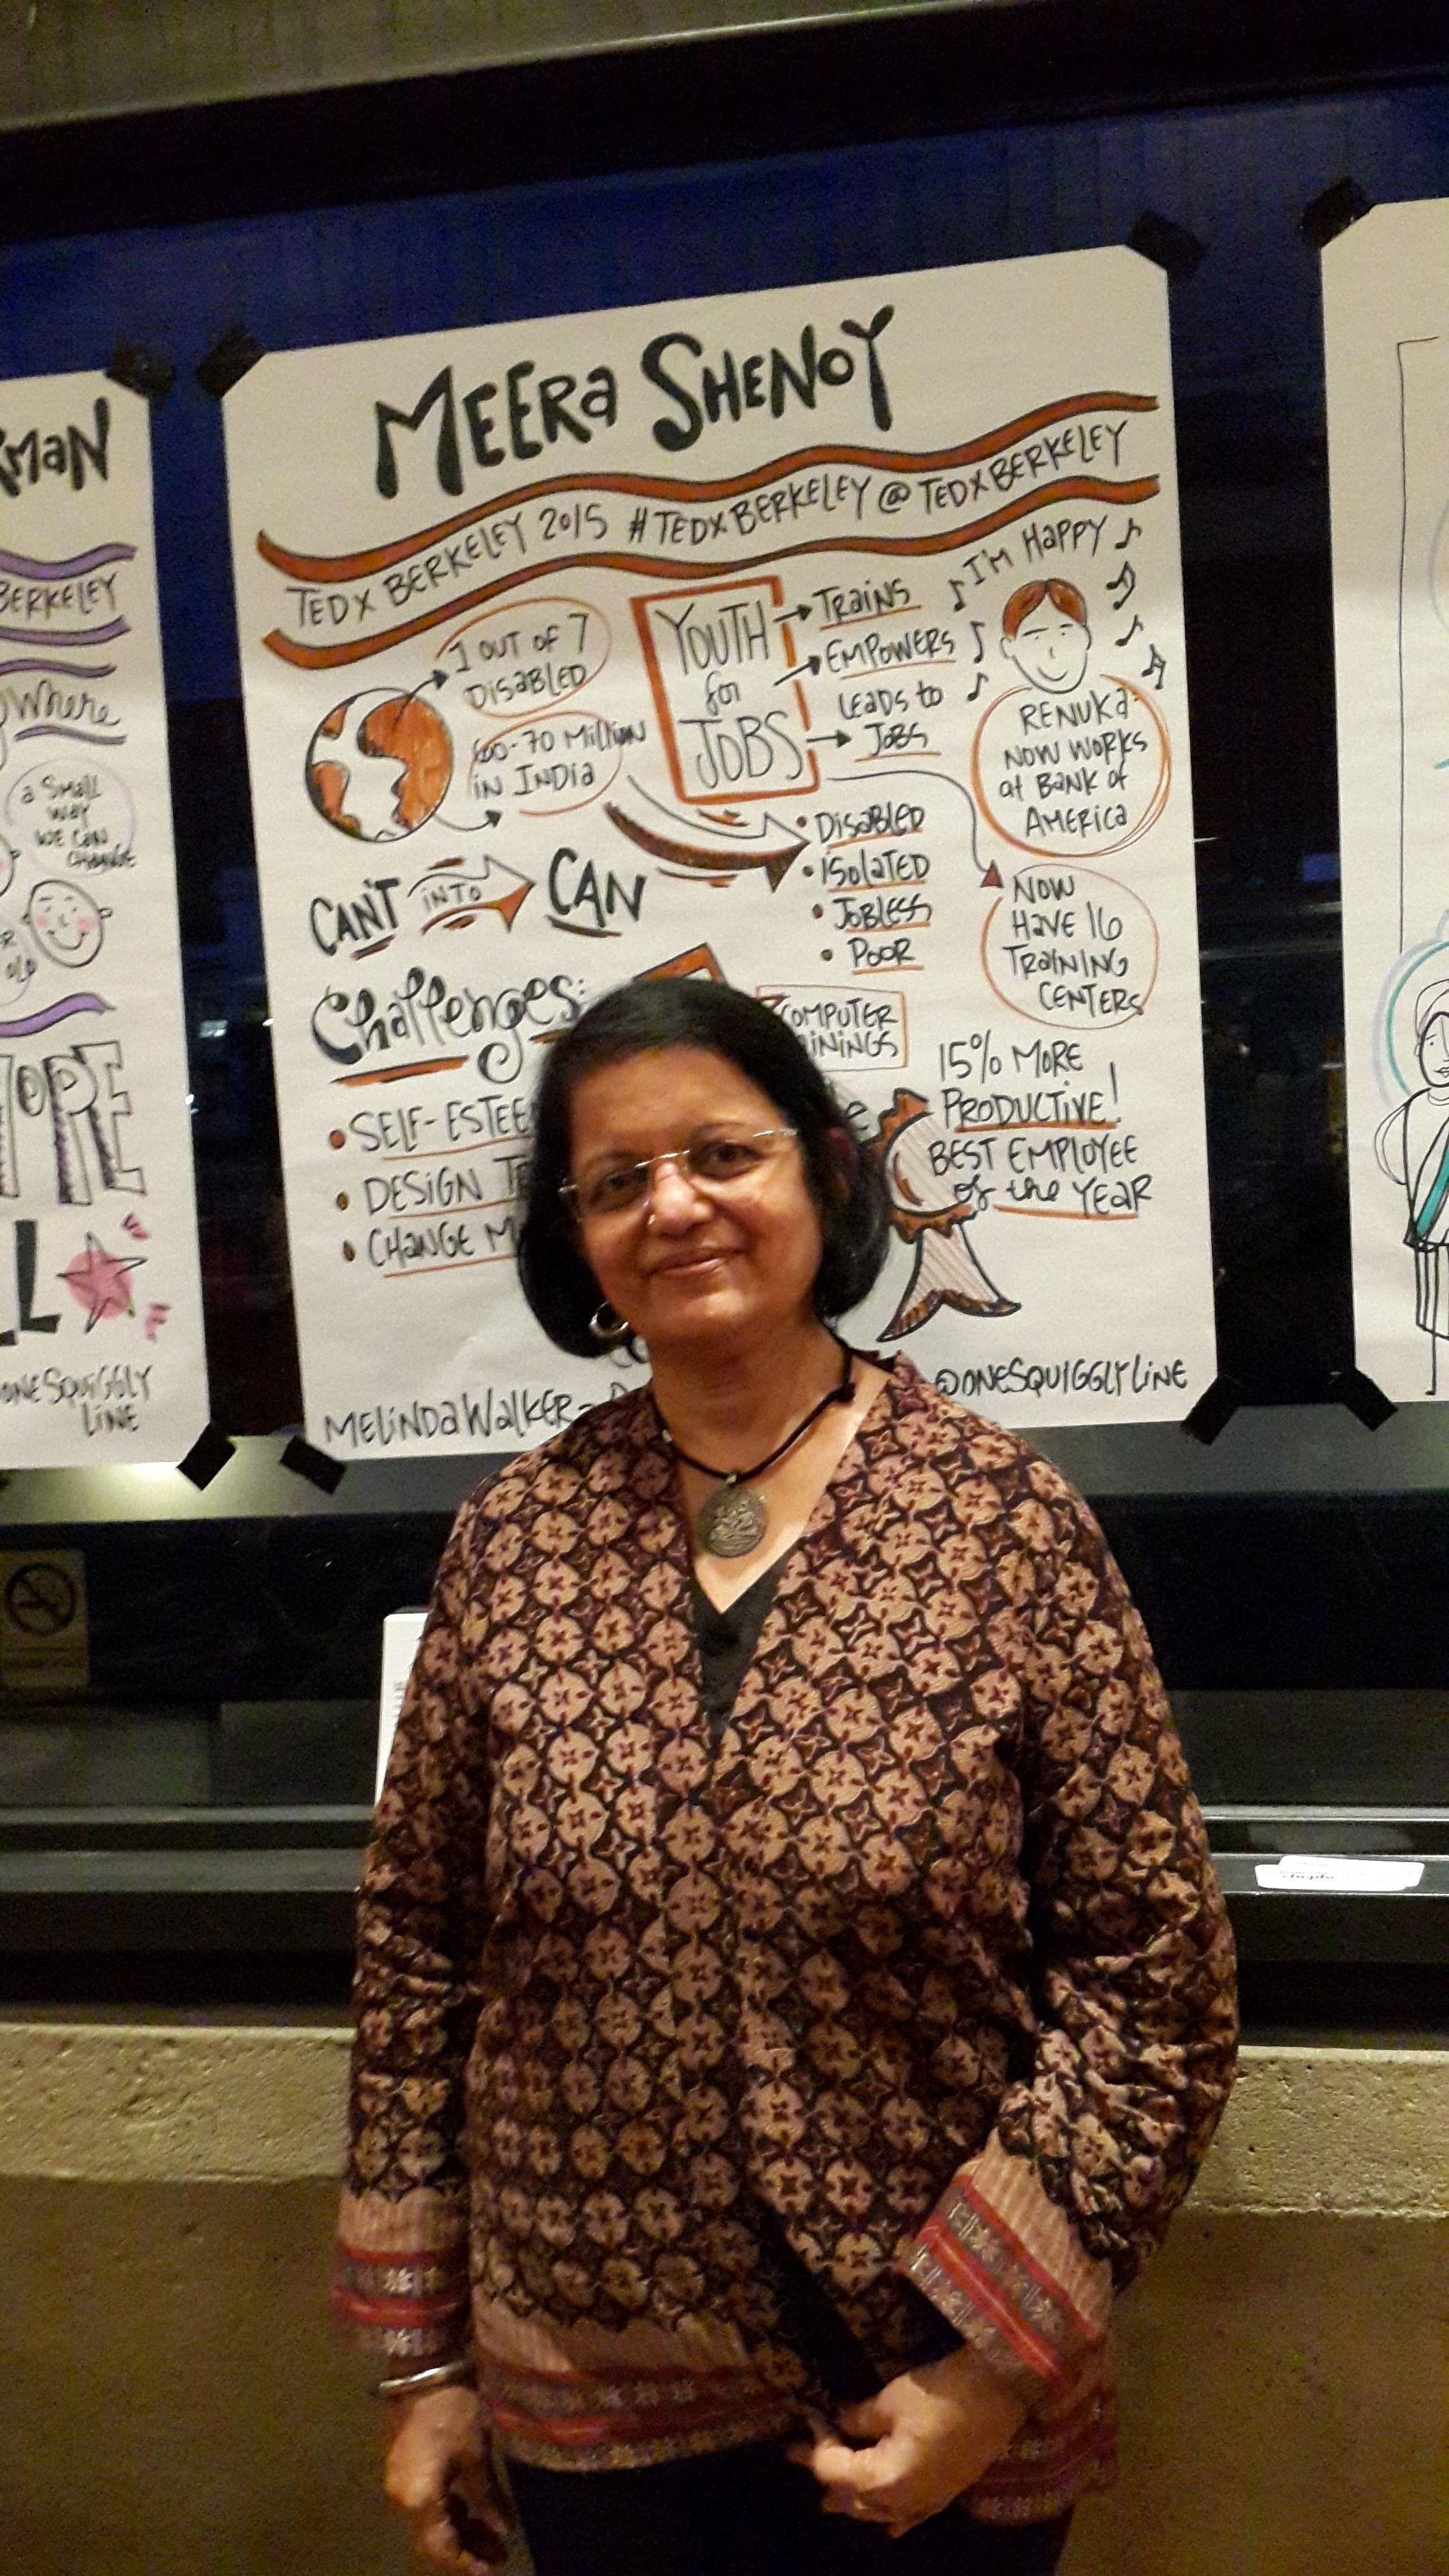 Meera Shenoy at TEDx Berkeley